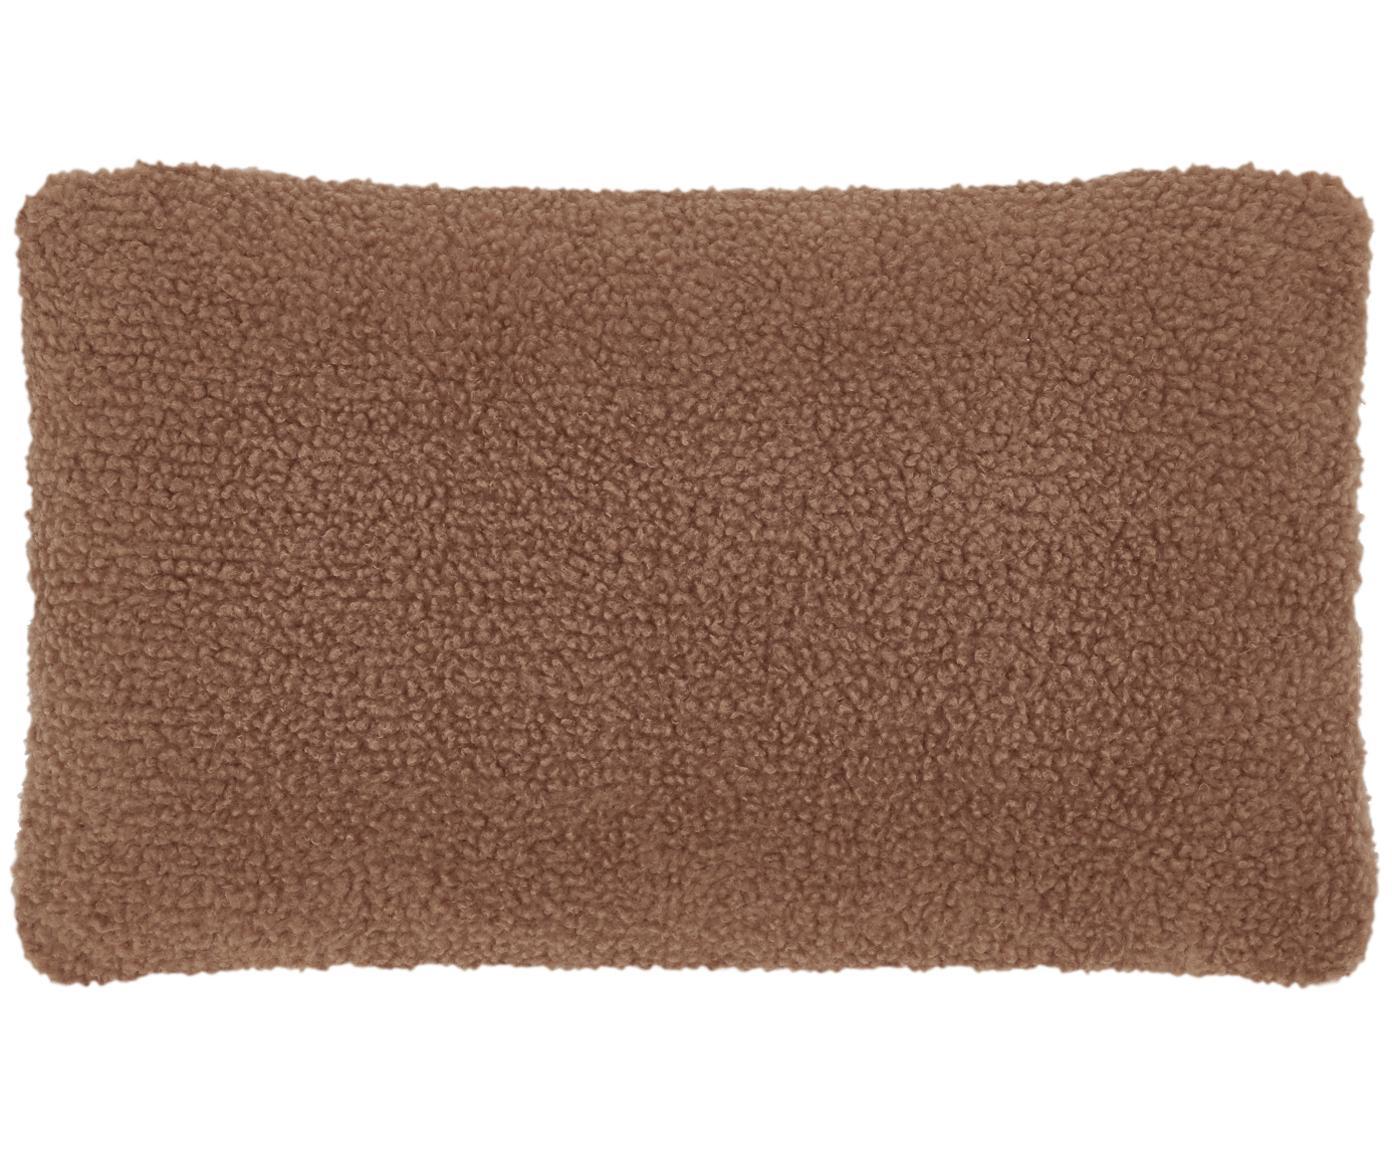 Flauschige Teddy-Kissenhülle Mille, Vorderseite: 100% Polyester (Teddyfell, Rückseite: 100% Polyester (Teddyfell, Braun, 30 x 50 cm